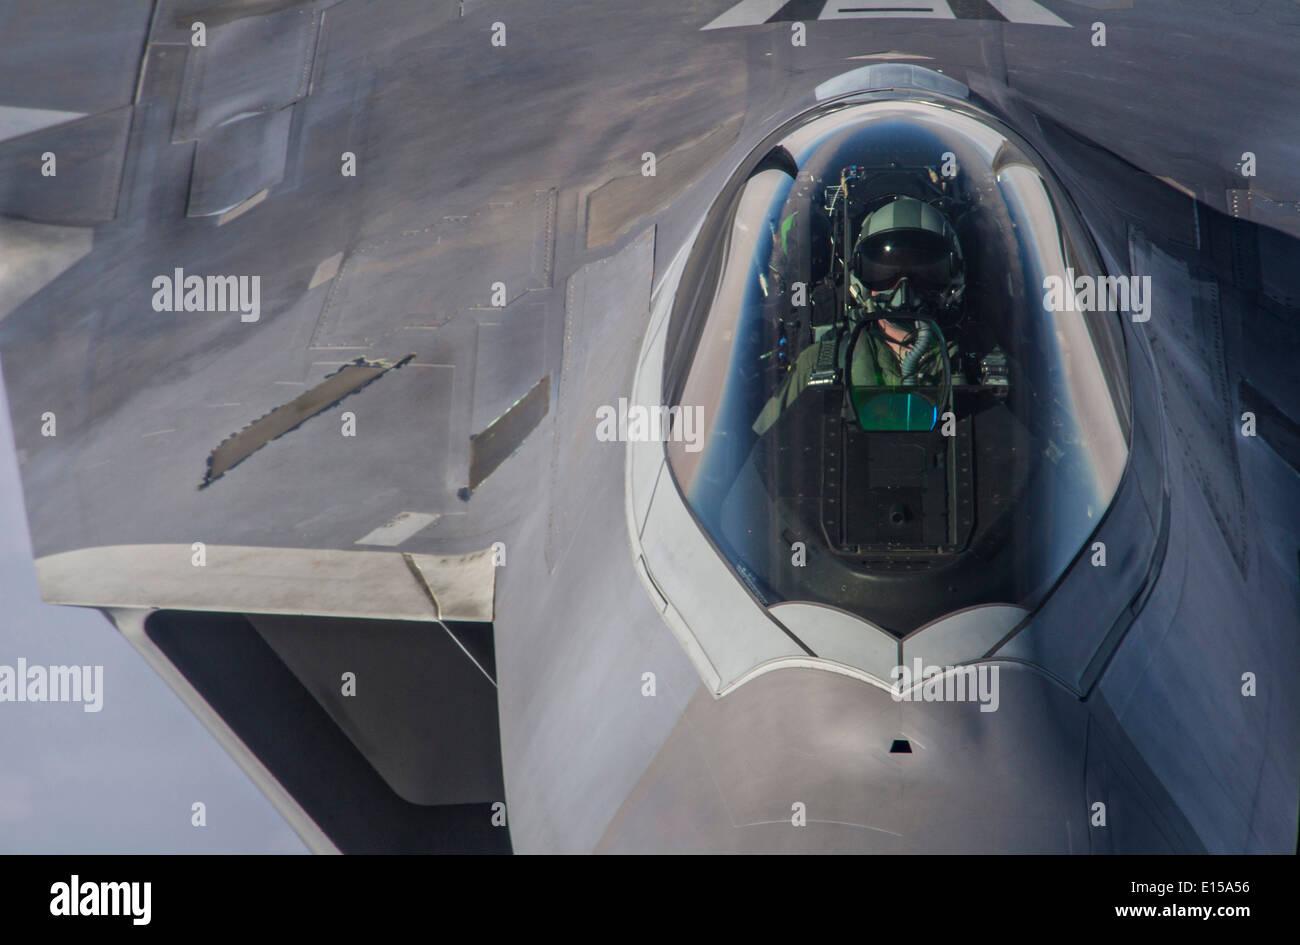 F22 Raptor Cockpit Stock Photos & F22 Raptor Cockpit Stock